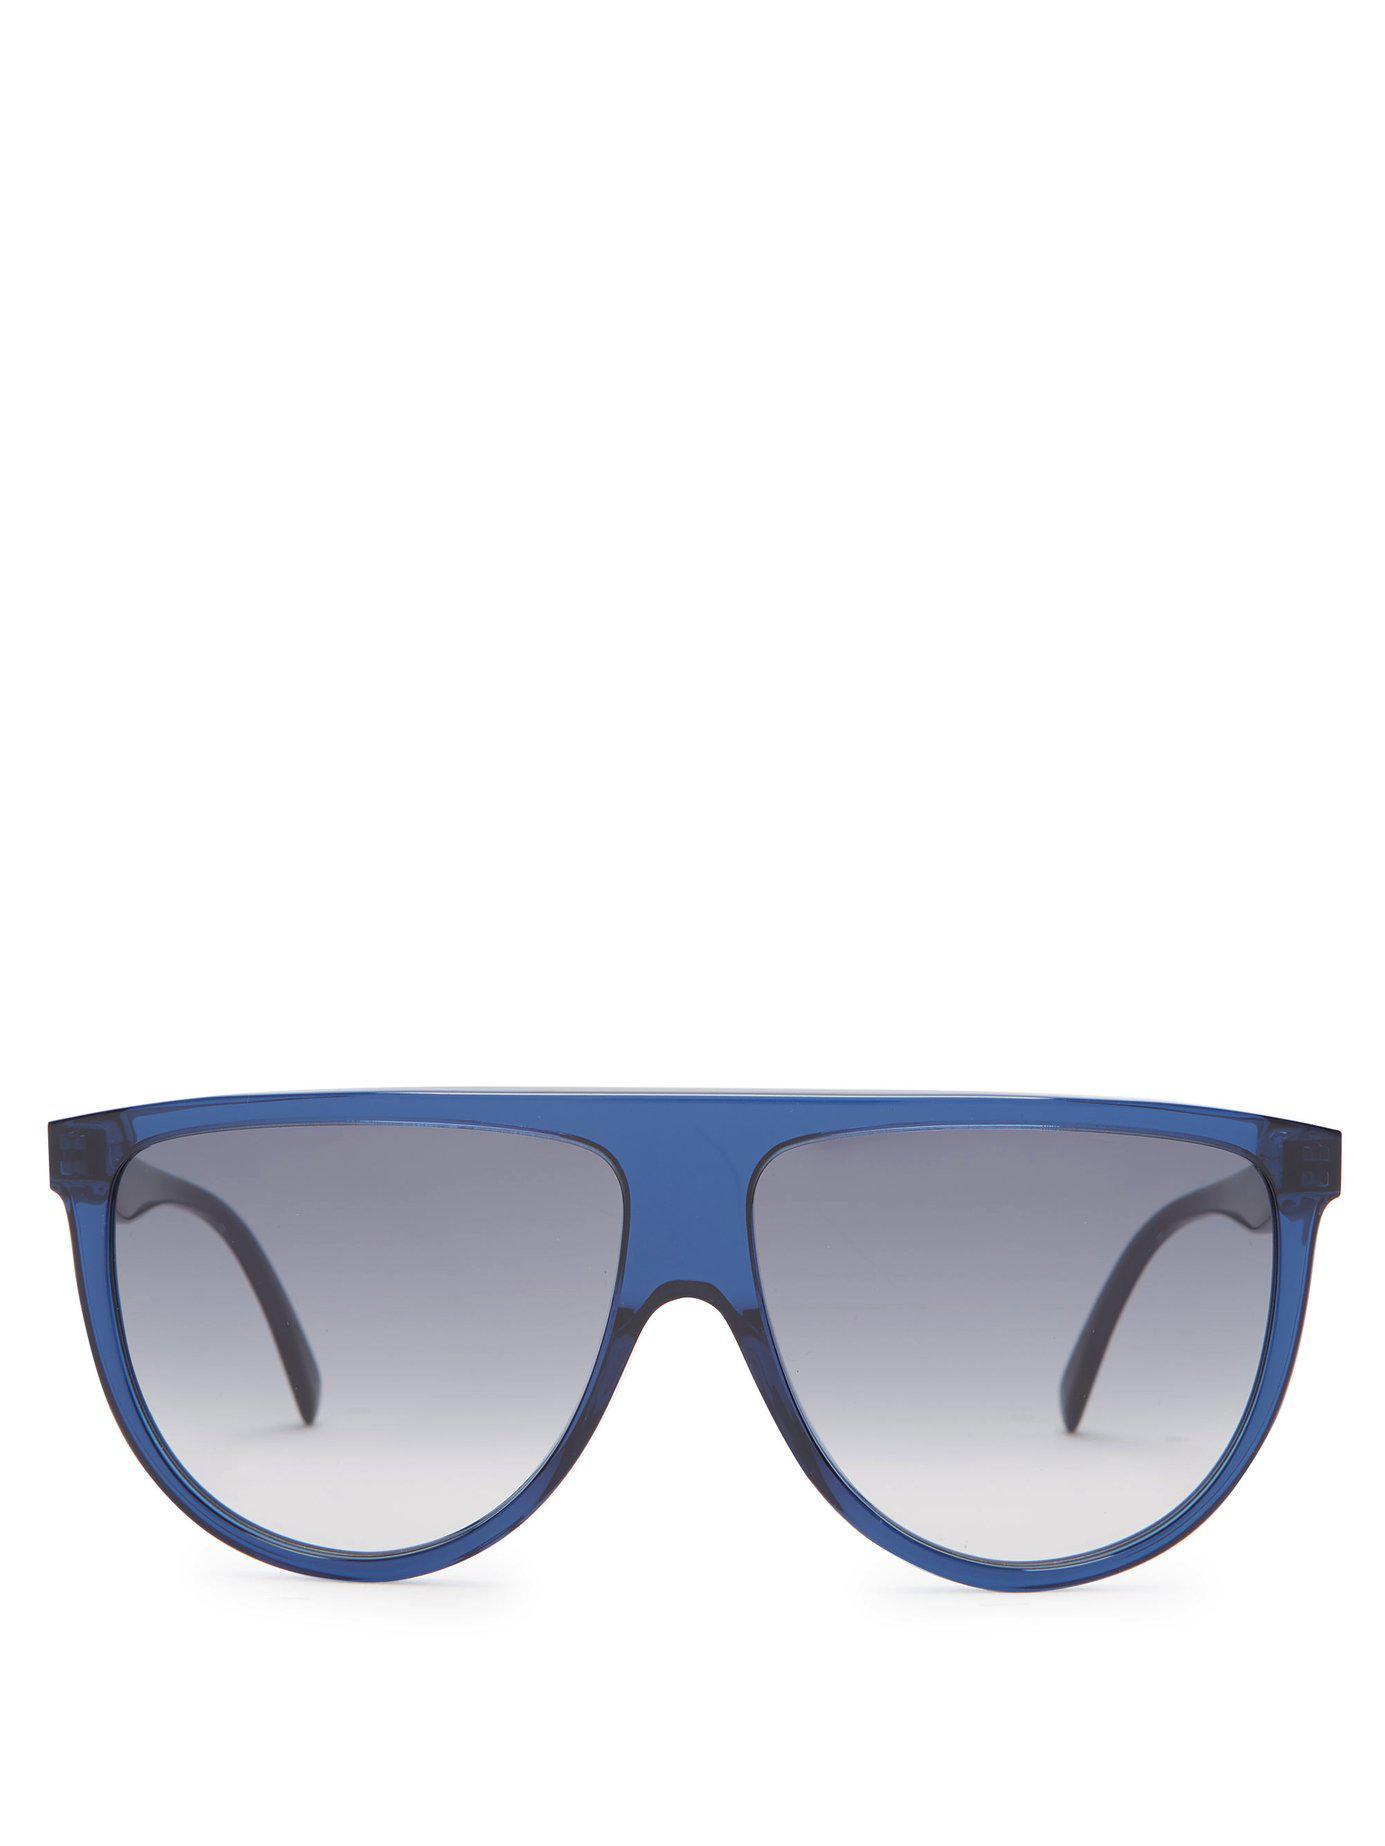 98cee30d4a0 Lyst - Céline Shadow D Frame Aviator Sunglasses in Blue